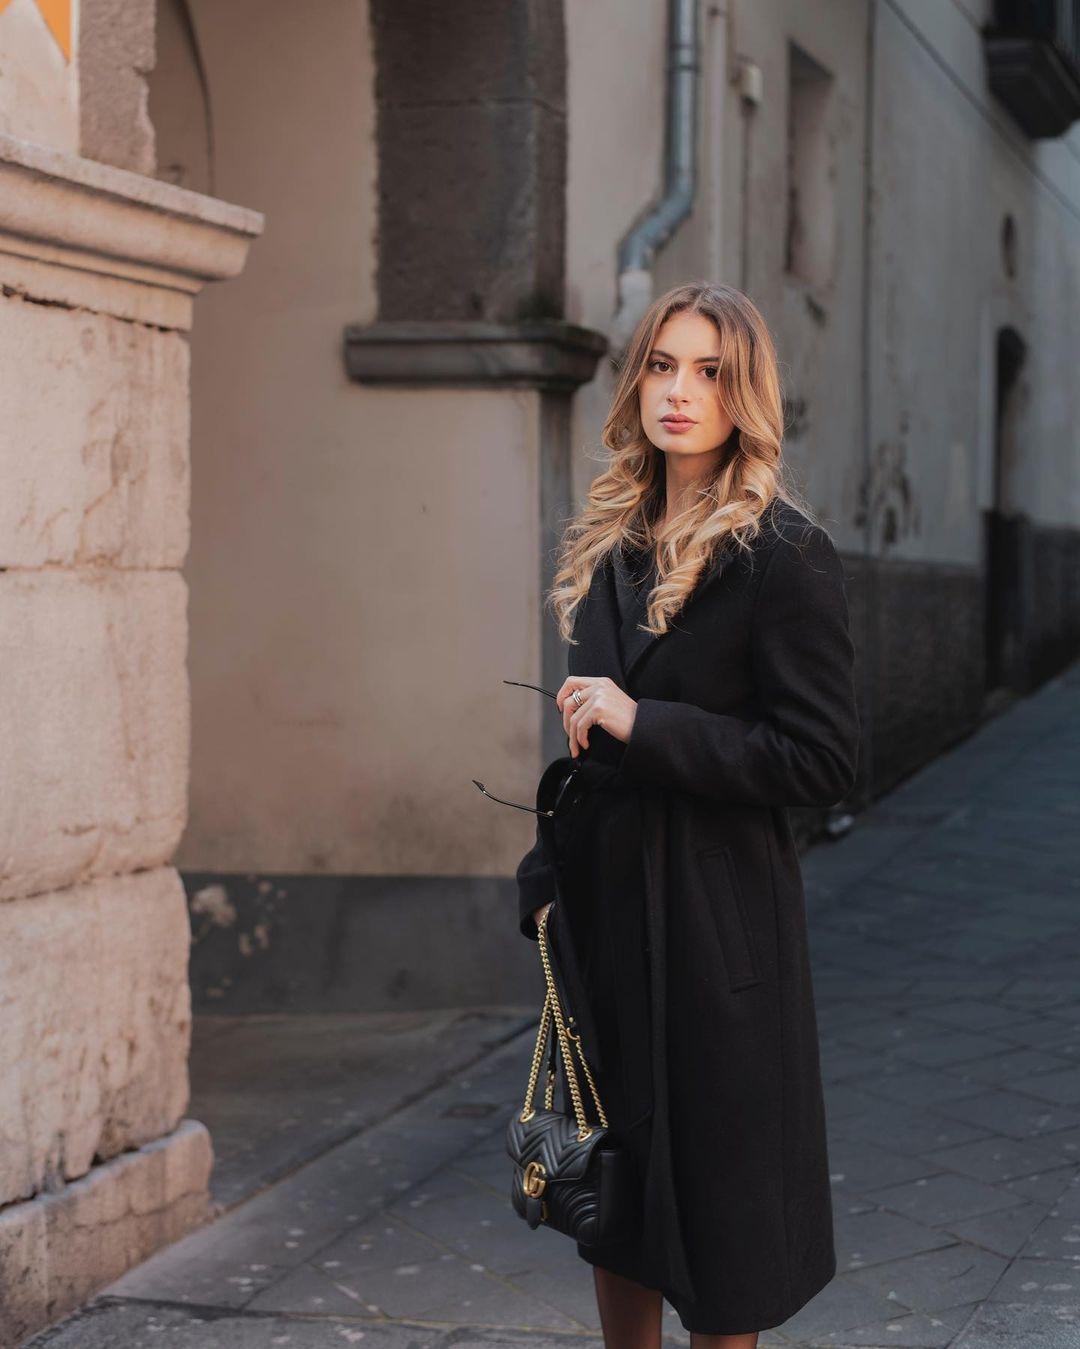 Chiara-Stile-Wallpapers-Insta-Fit-Bio-1